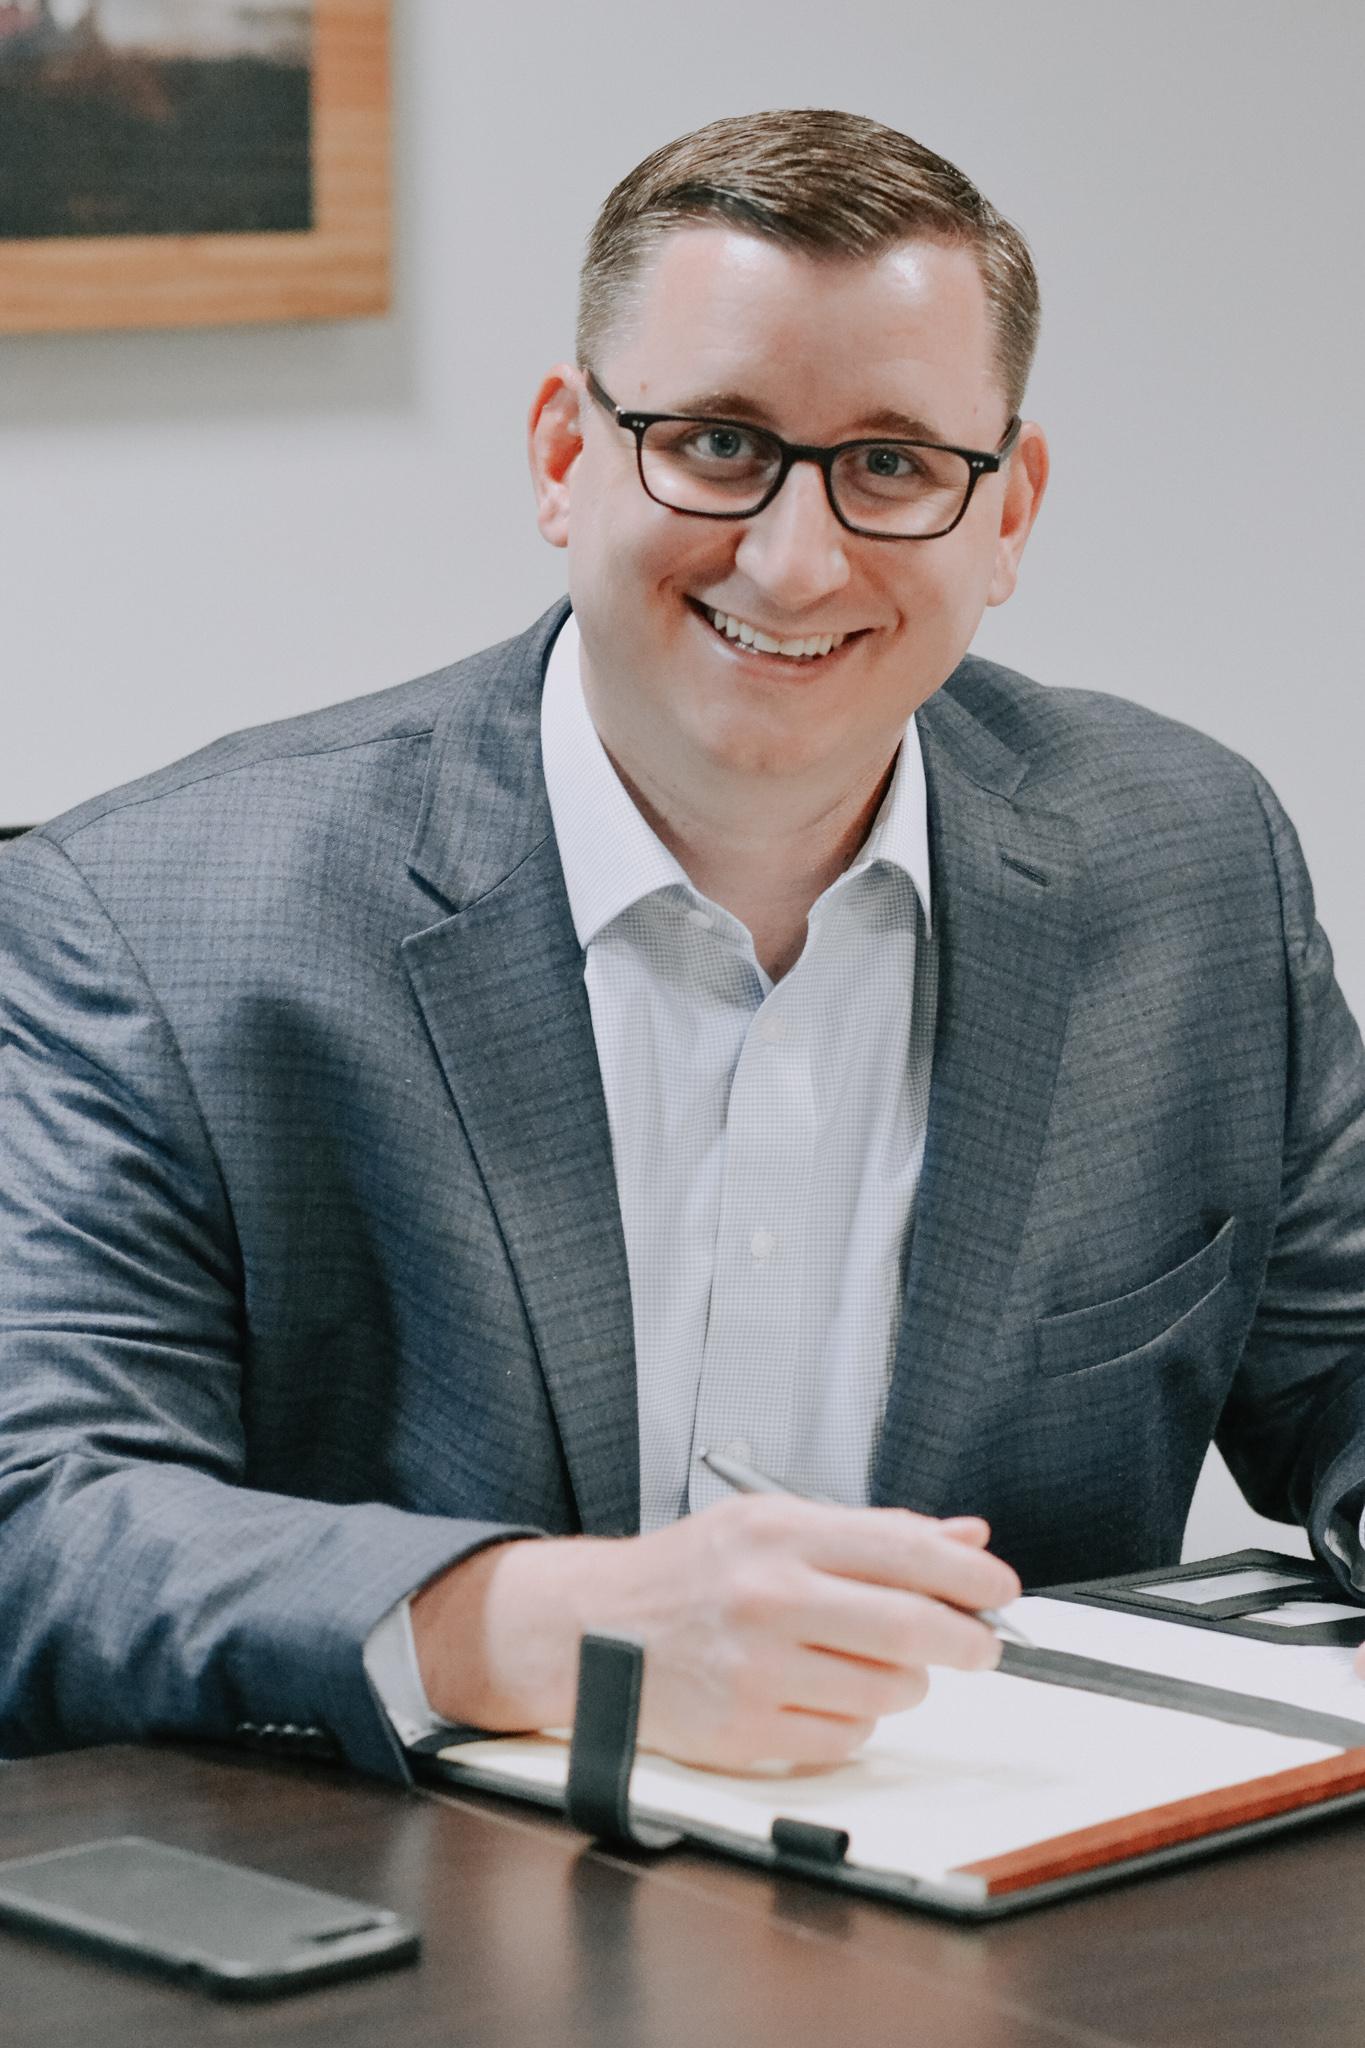 Portland sexual harassment attorney Kevin A. Jones